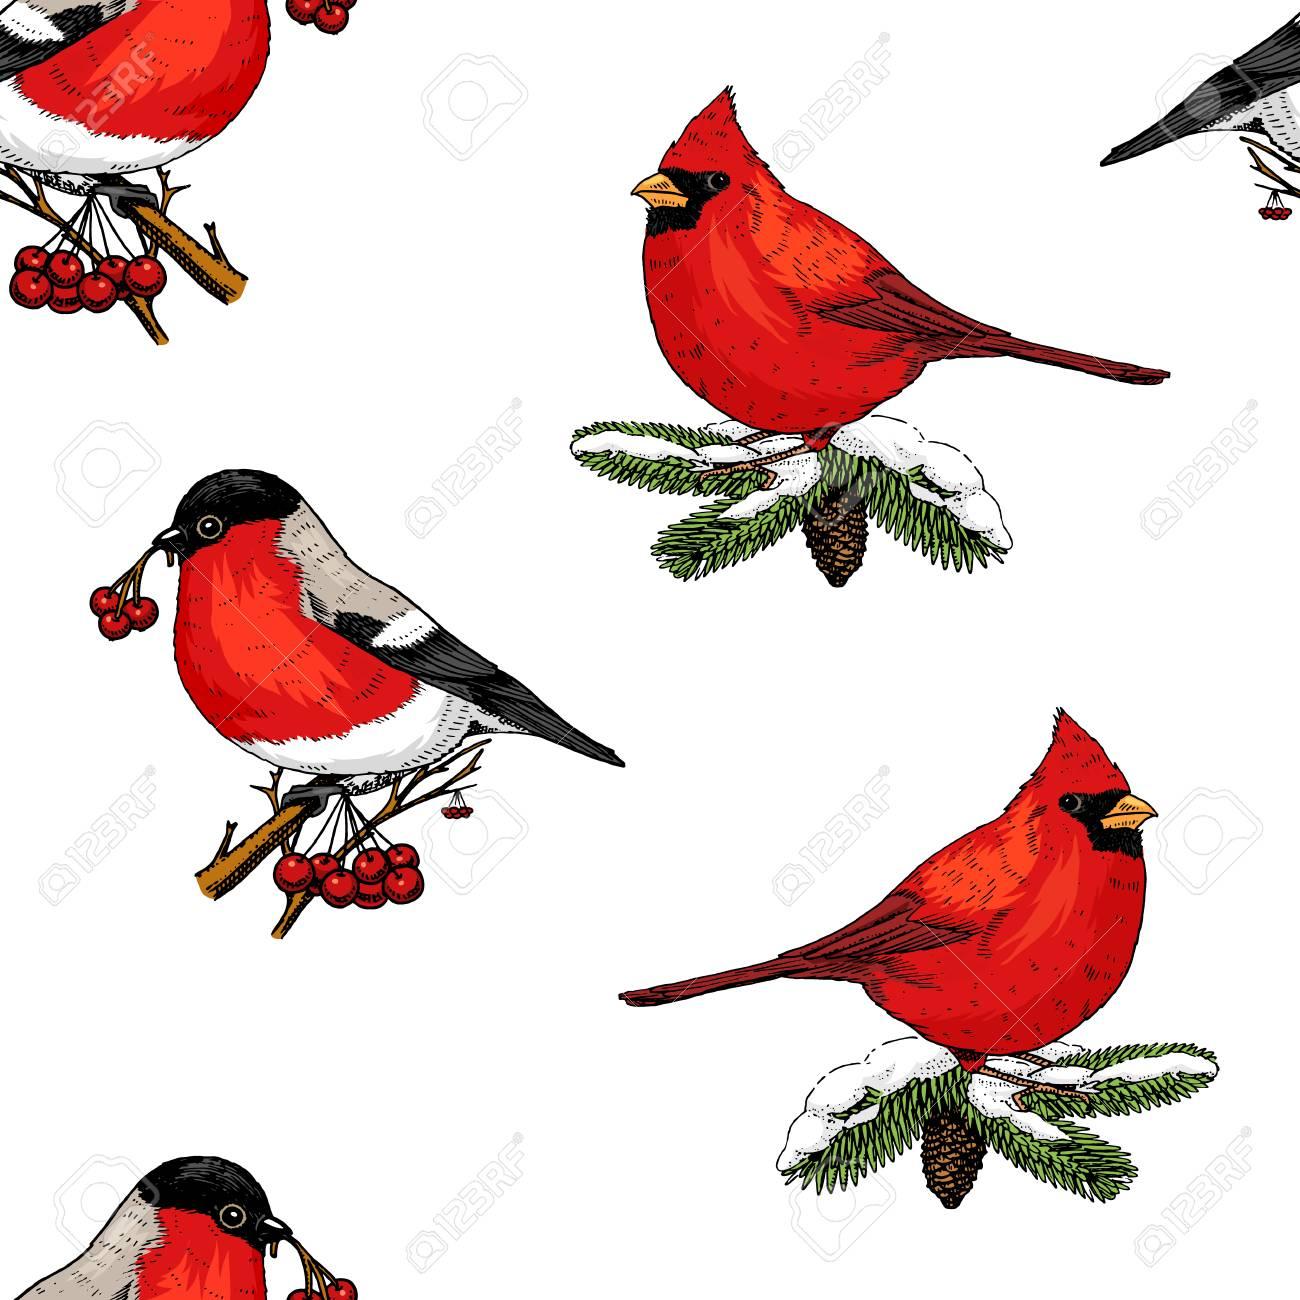 Christmas Cardinals Clipart.Seamless Pattern Holly And Bullfinch Red Cardinal Birds Merry